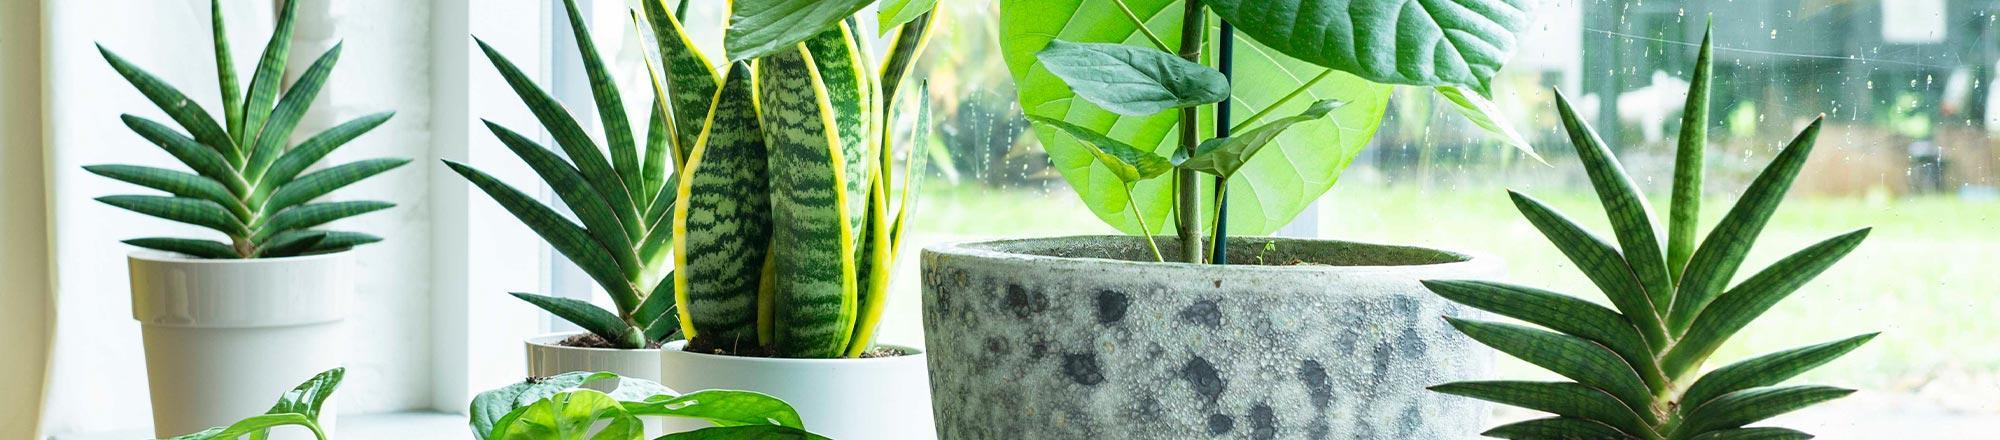 Kamerplanten verzorgen